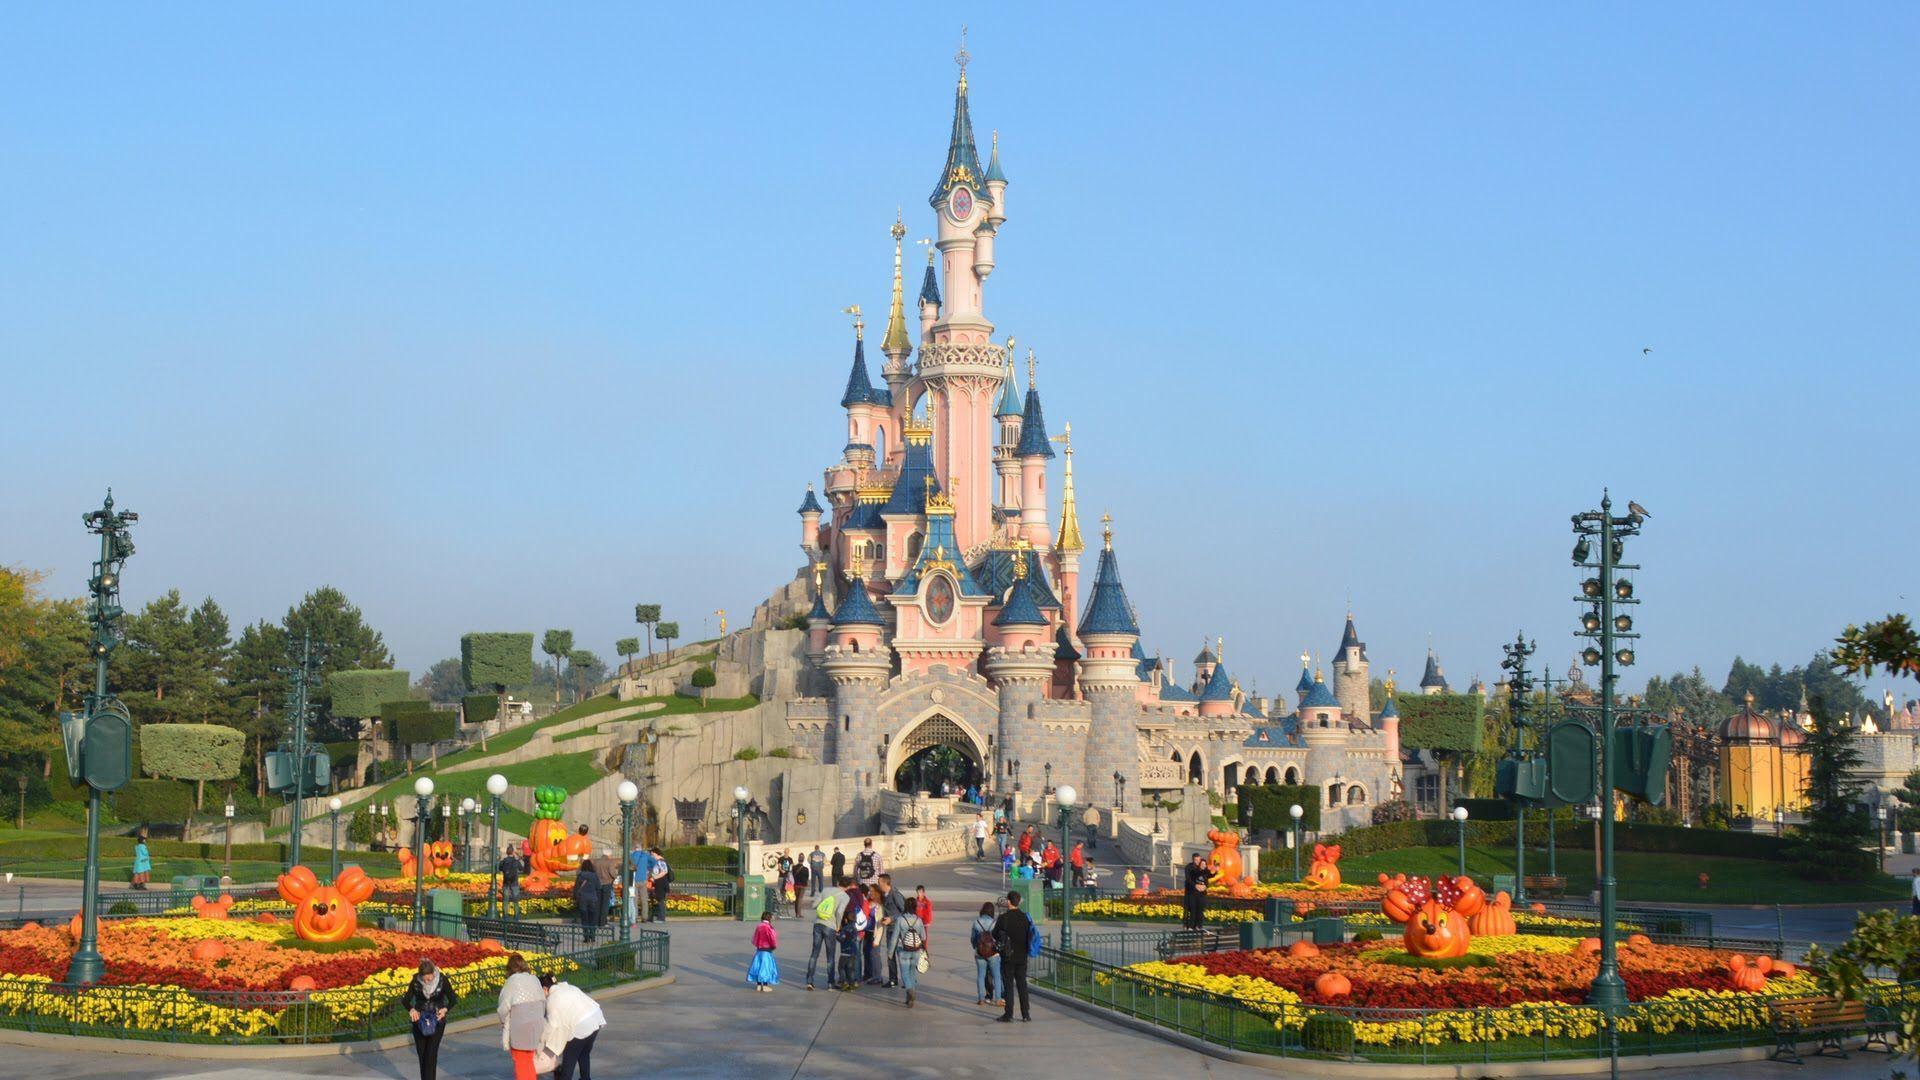 Castle Disneyland Paris Wallpapers Wallpaper Cave